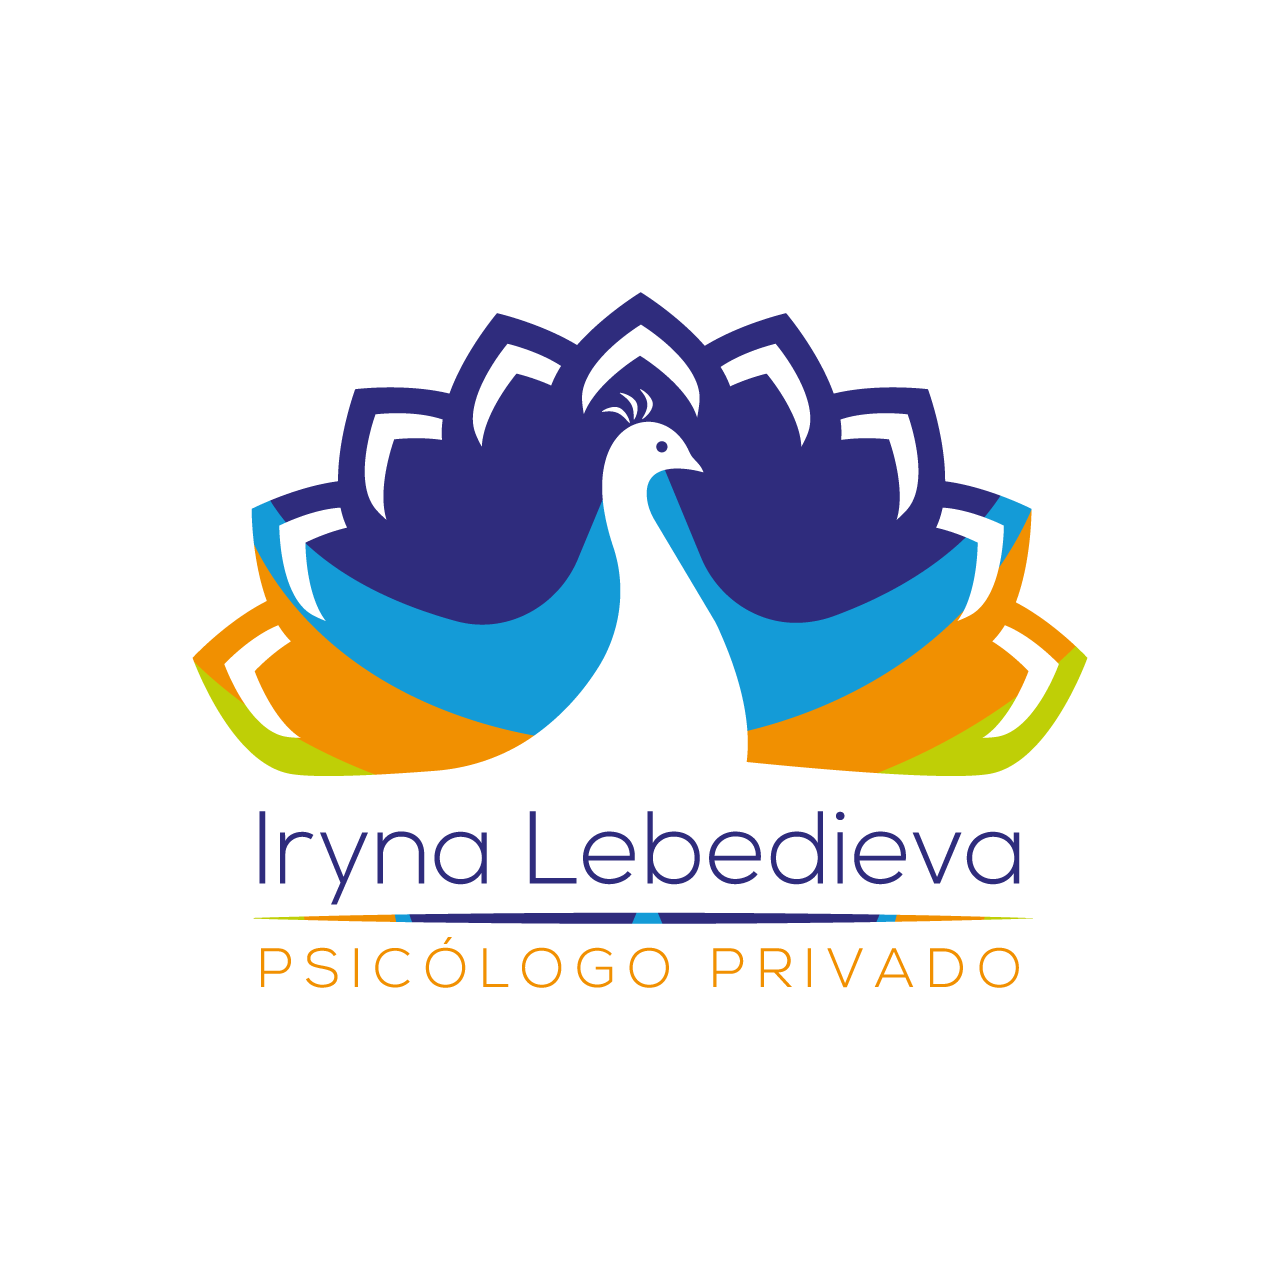 Iryna Lebedieva Logo design